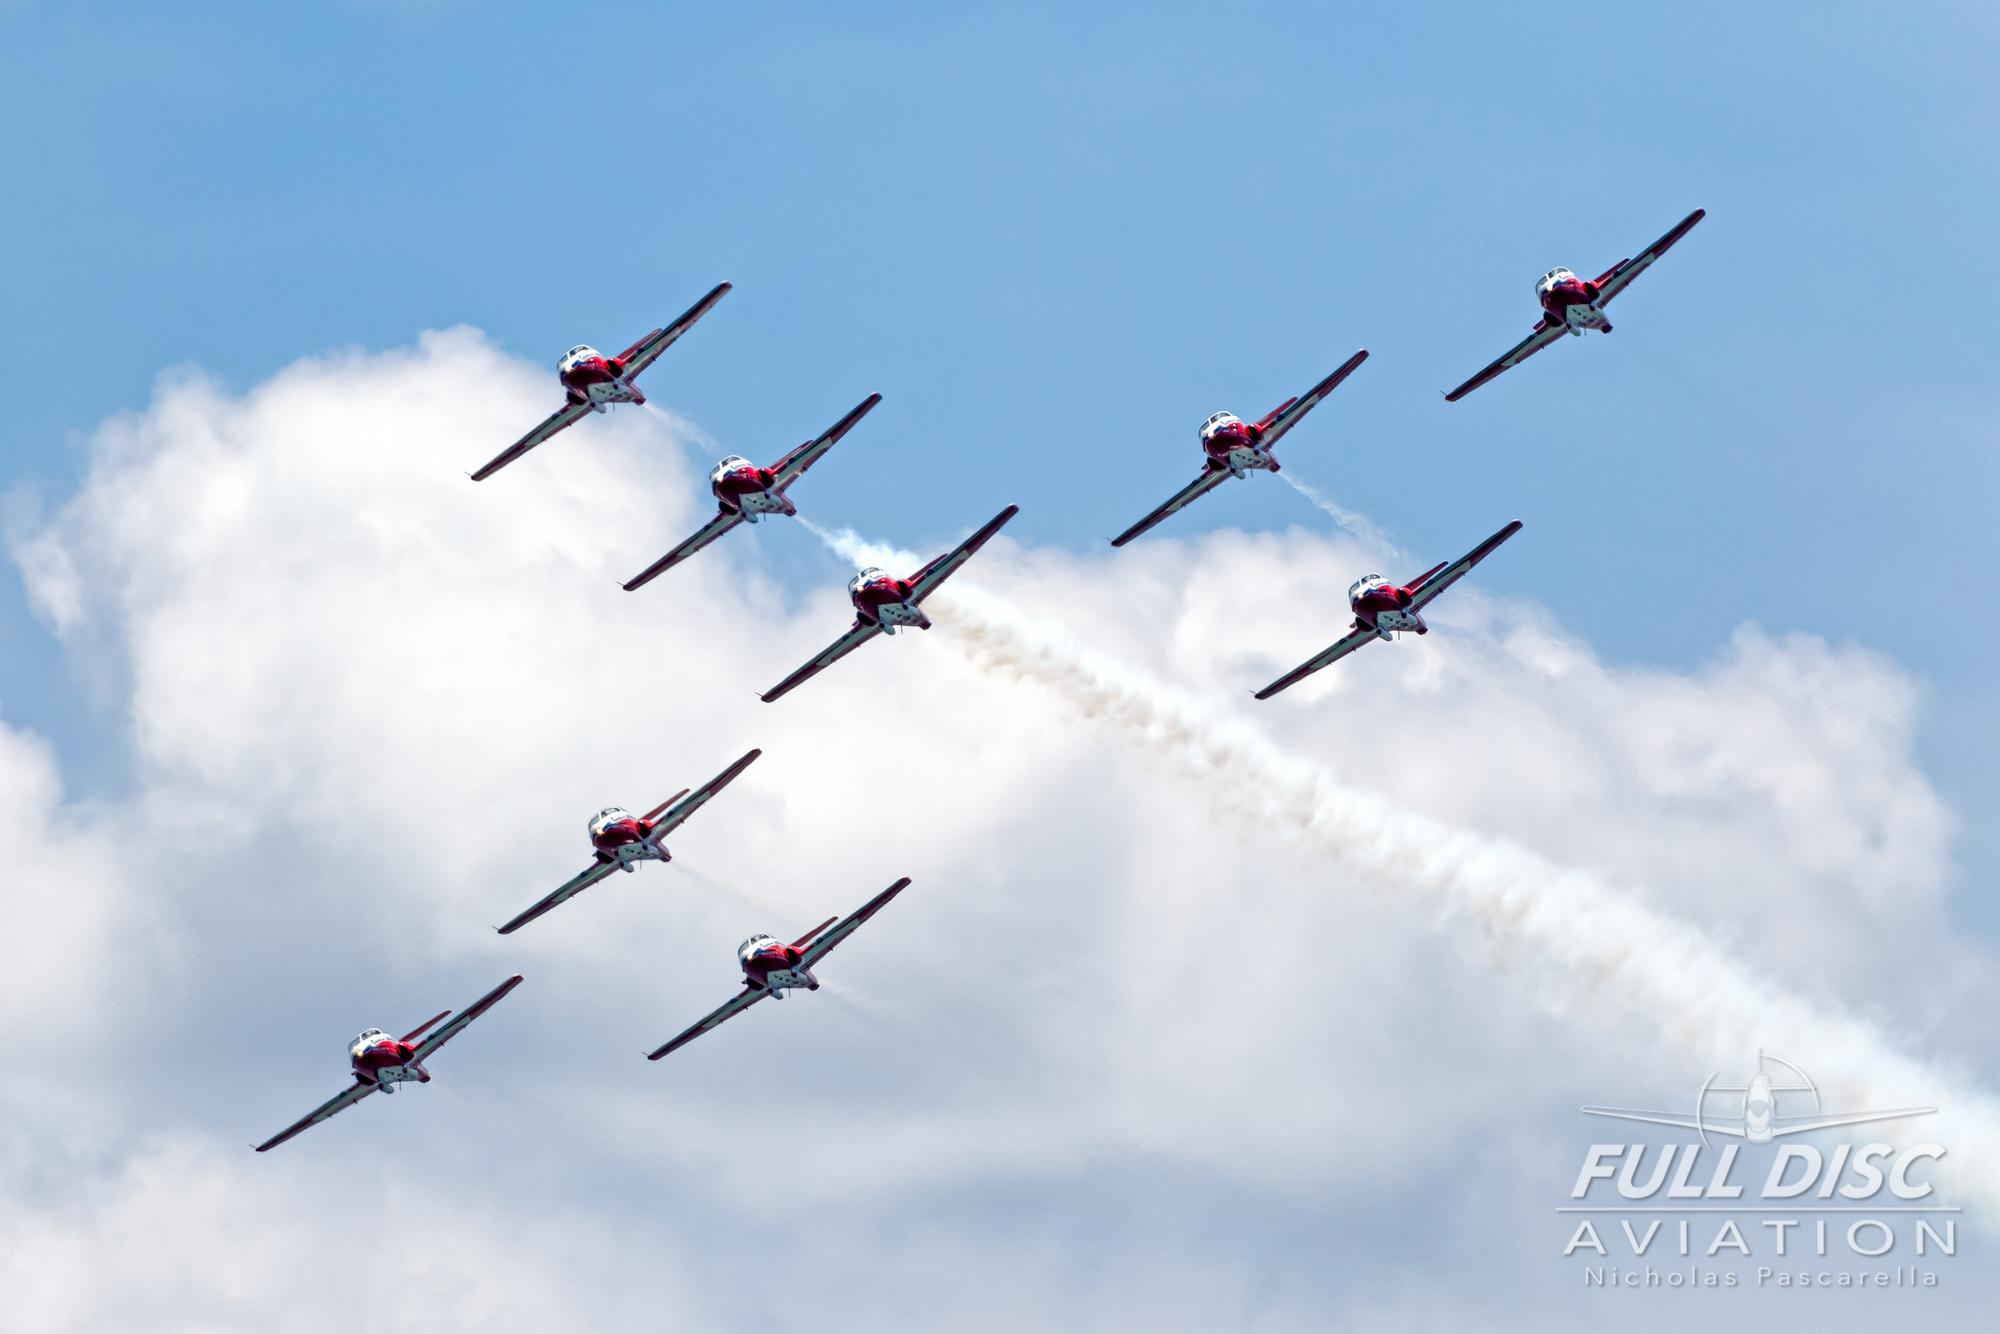 nickpascarella_fulldiscaviation_oceancityairshow_aviation_speedbirdbelly_snowbirds.jpg